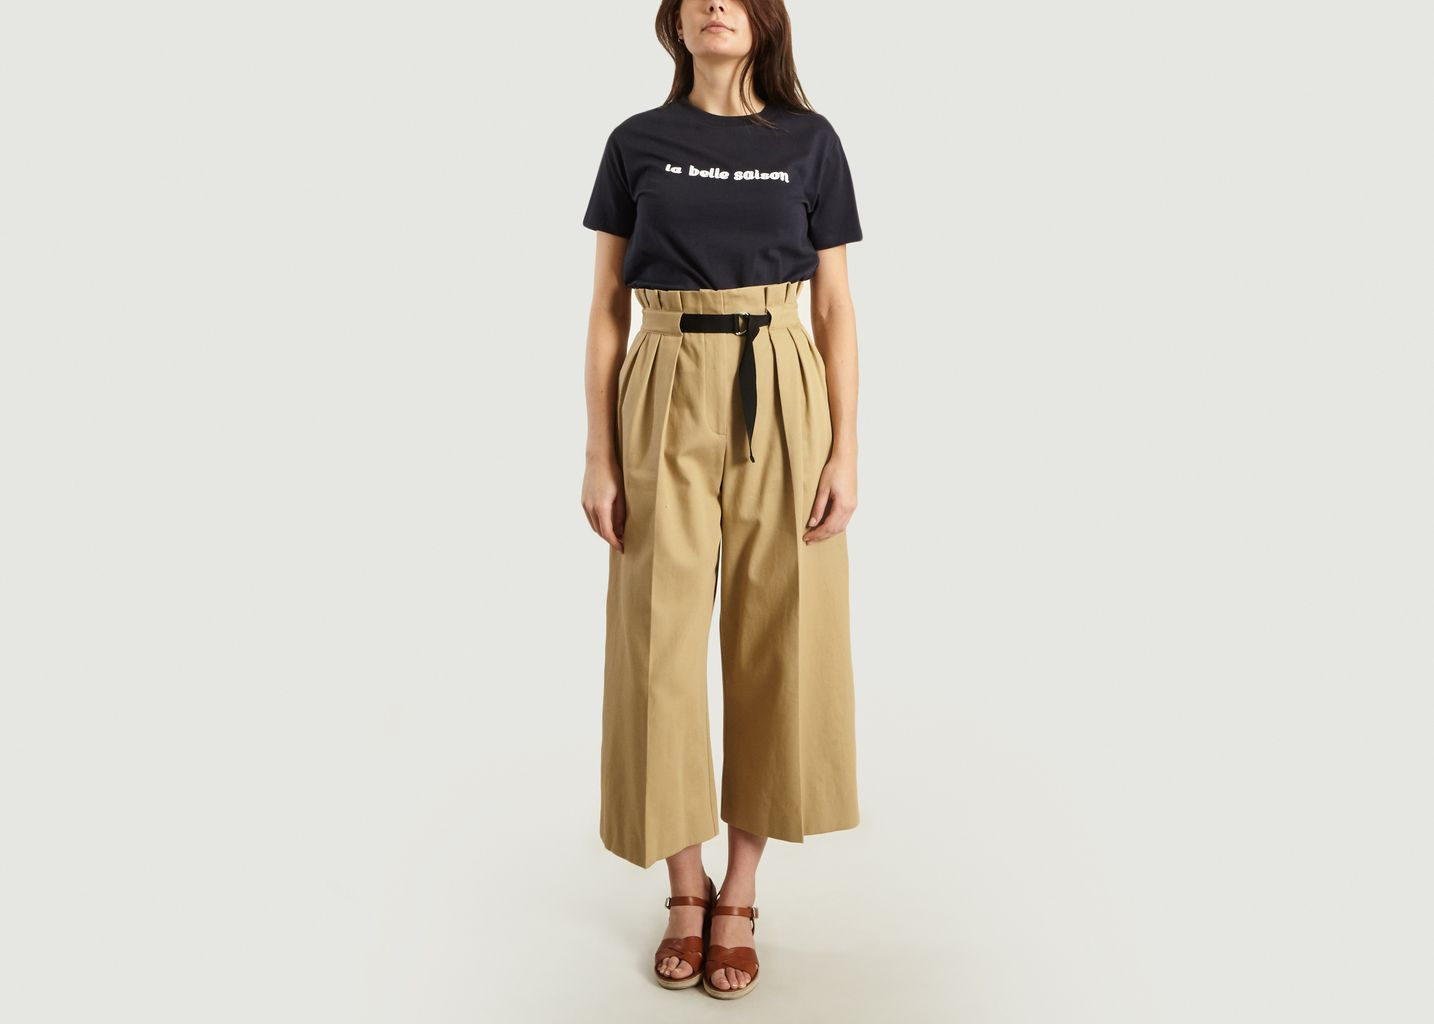 T-Shirt La Belle Saison - Tara Jarmon